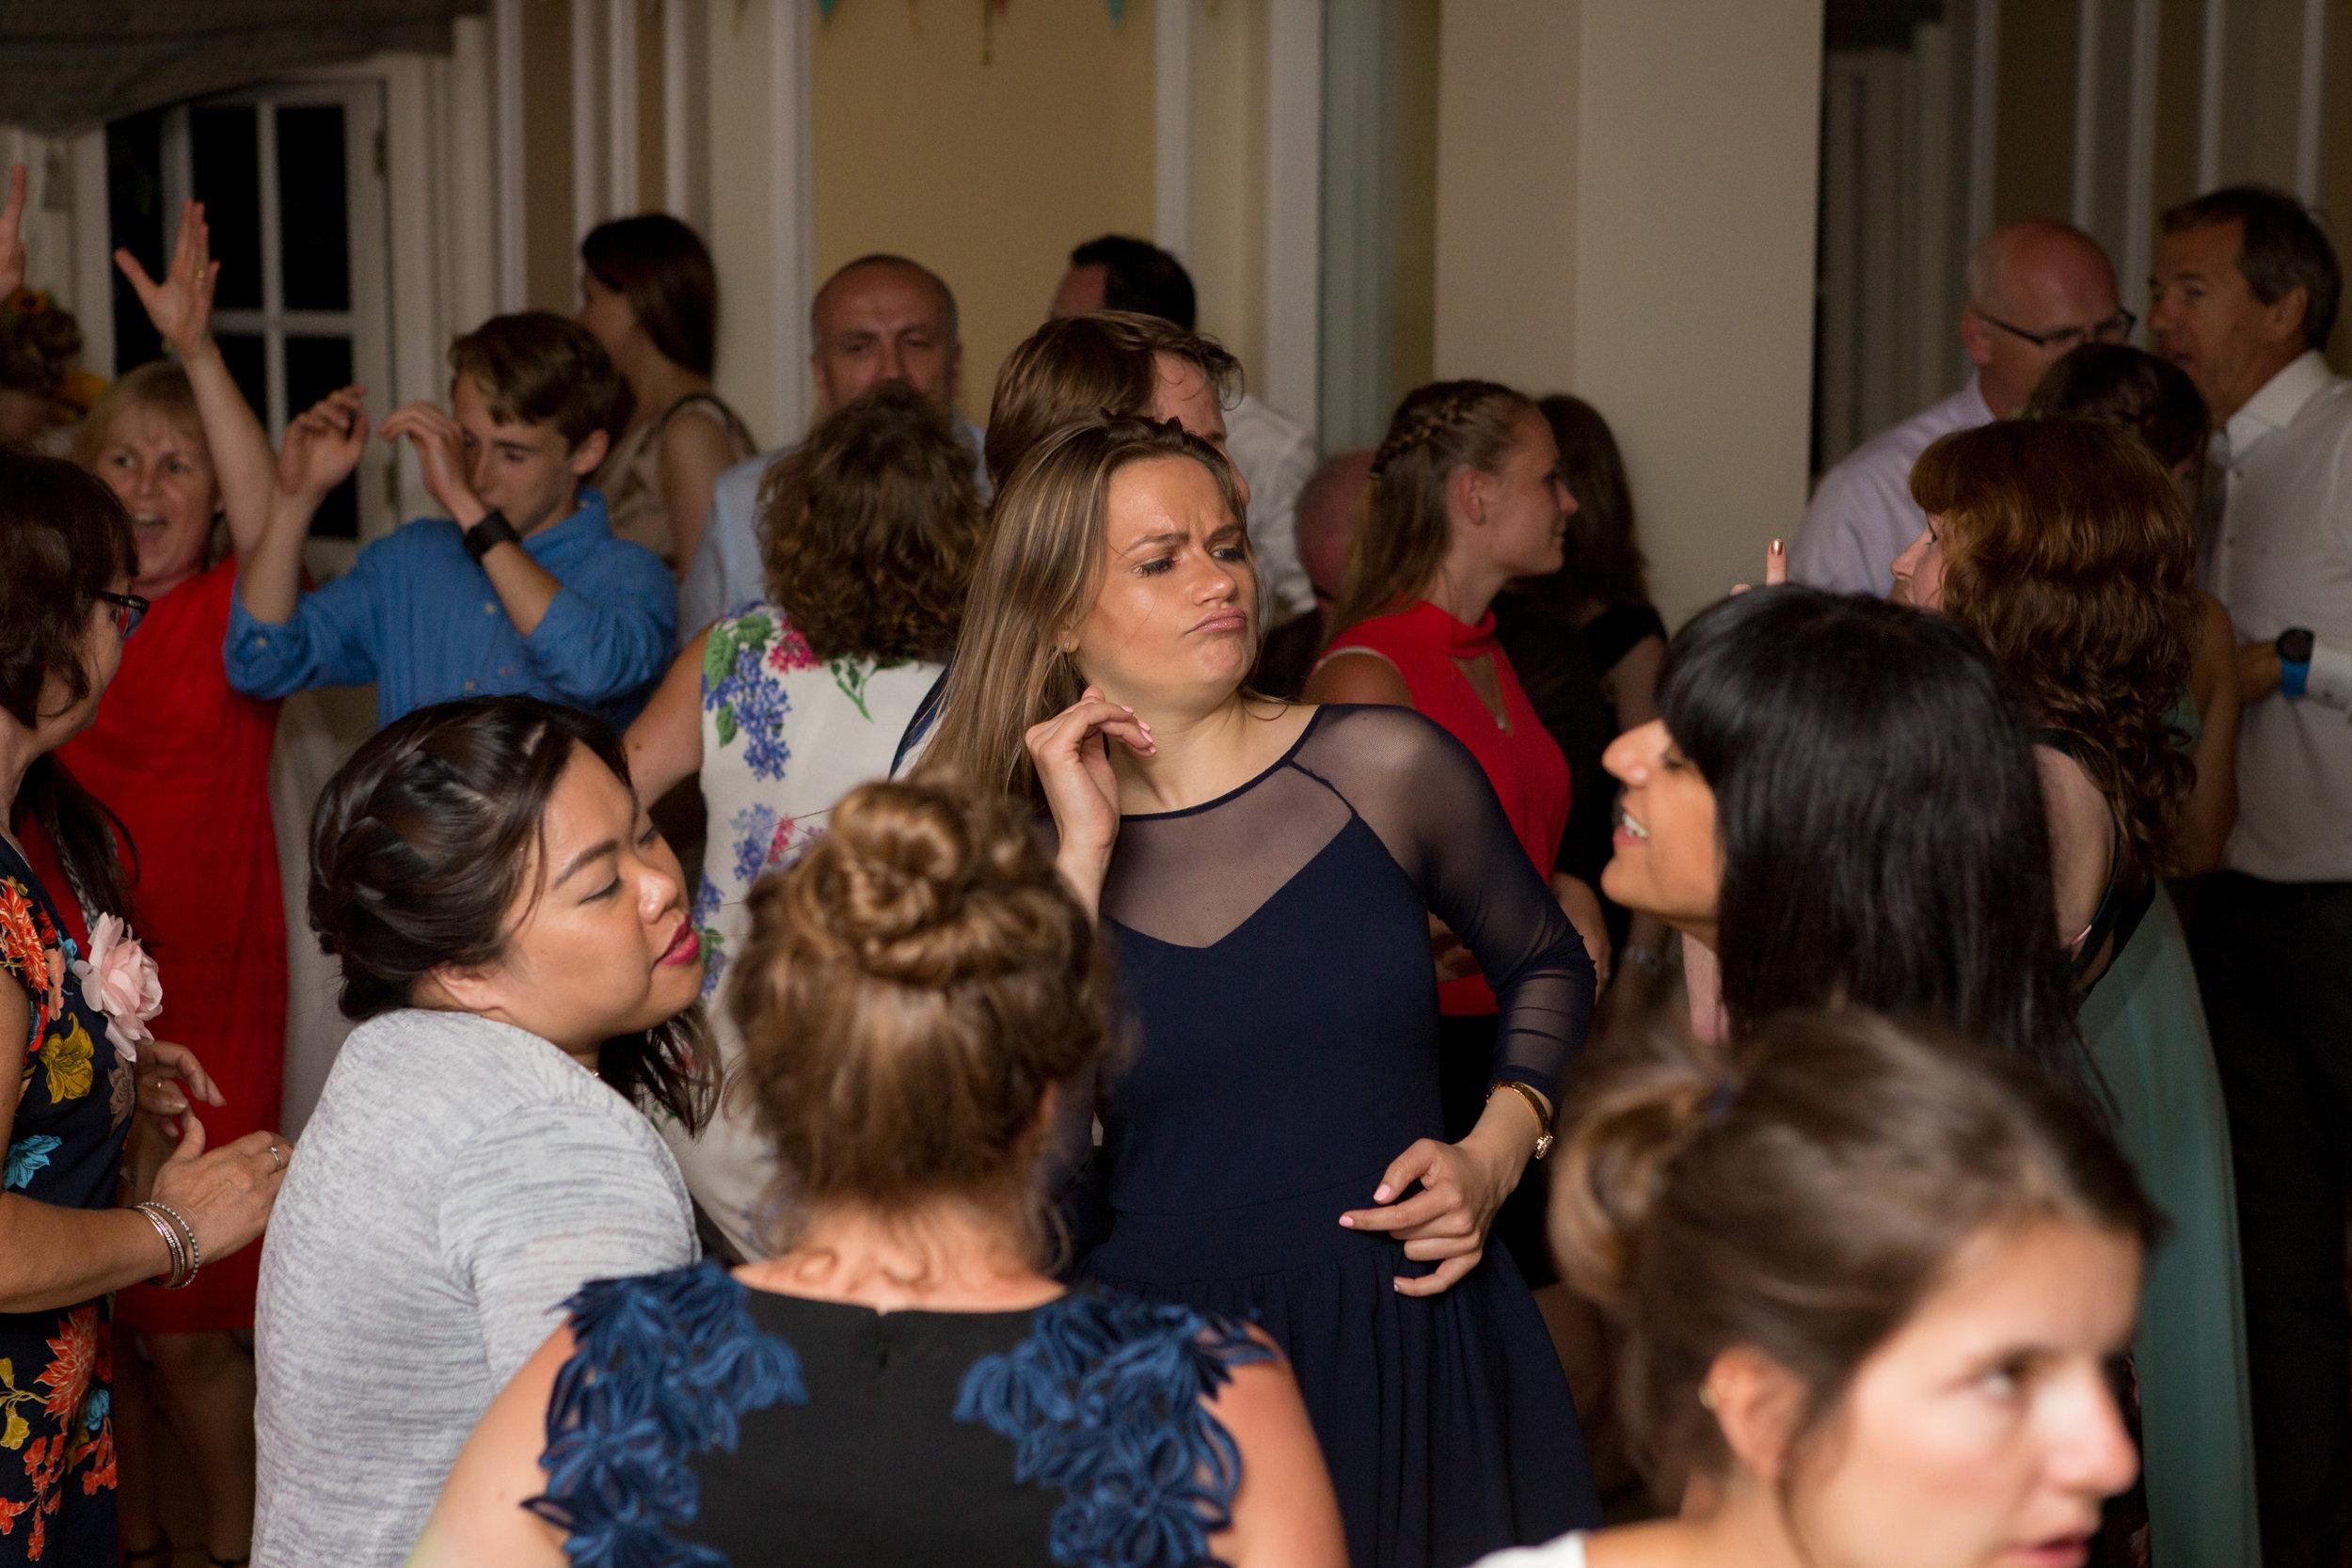 Bucklands-Tout-Saints-Hotel-Devon-Wedding-Photography-43.jpg